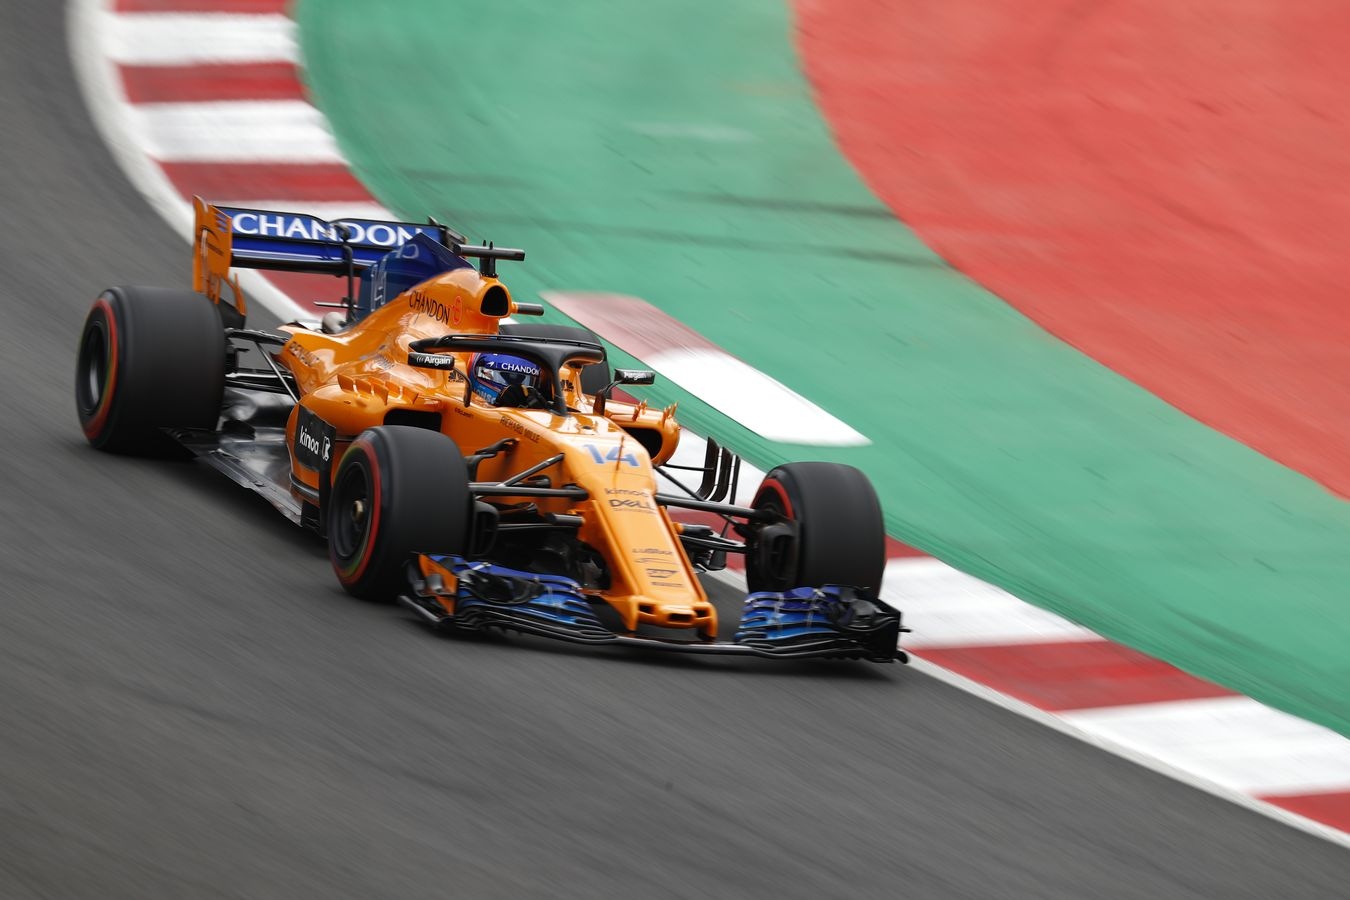 McLaren Racing - 2018 Spanish Grand Prix